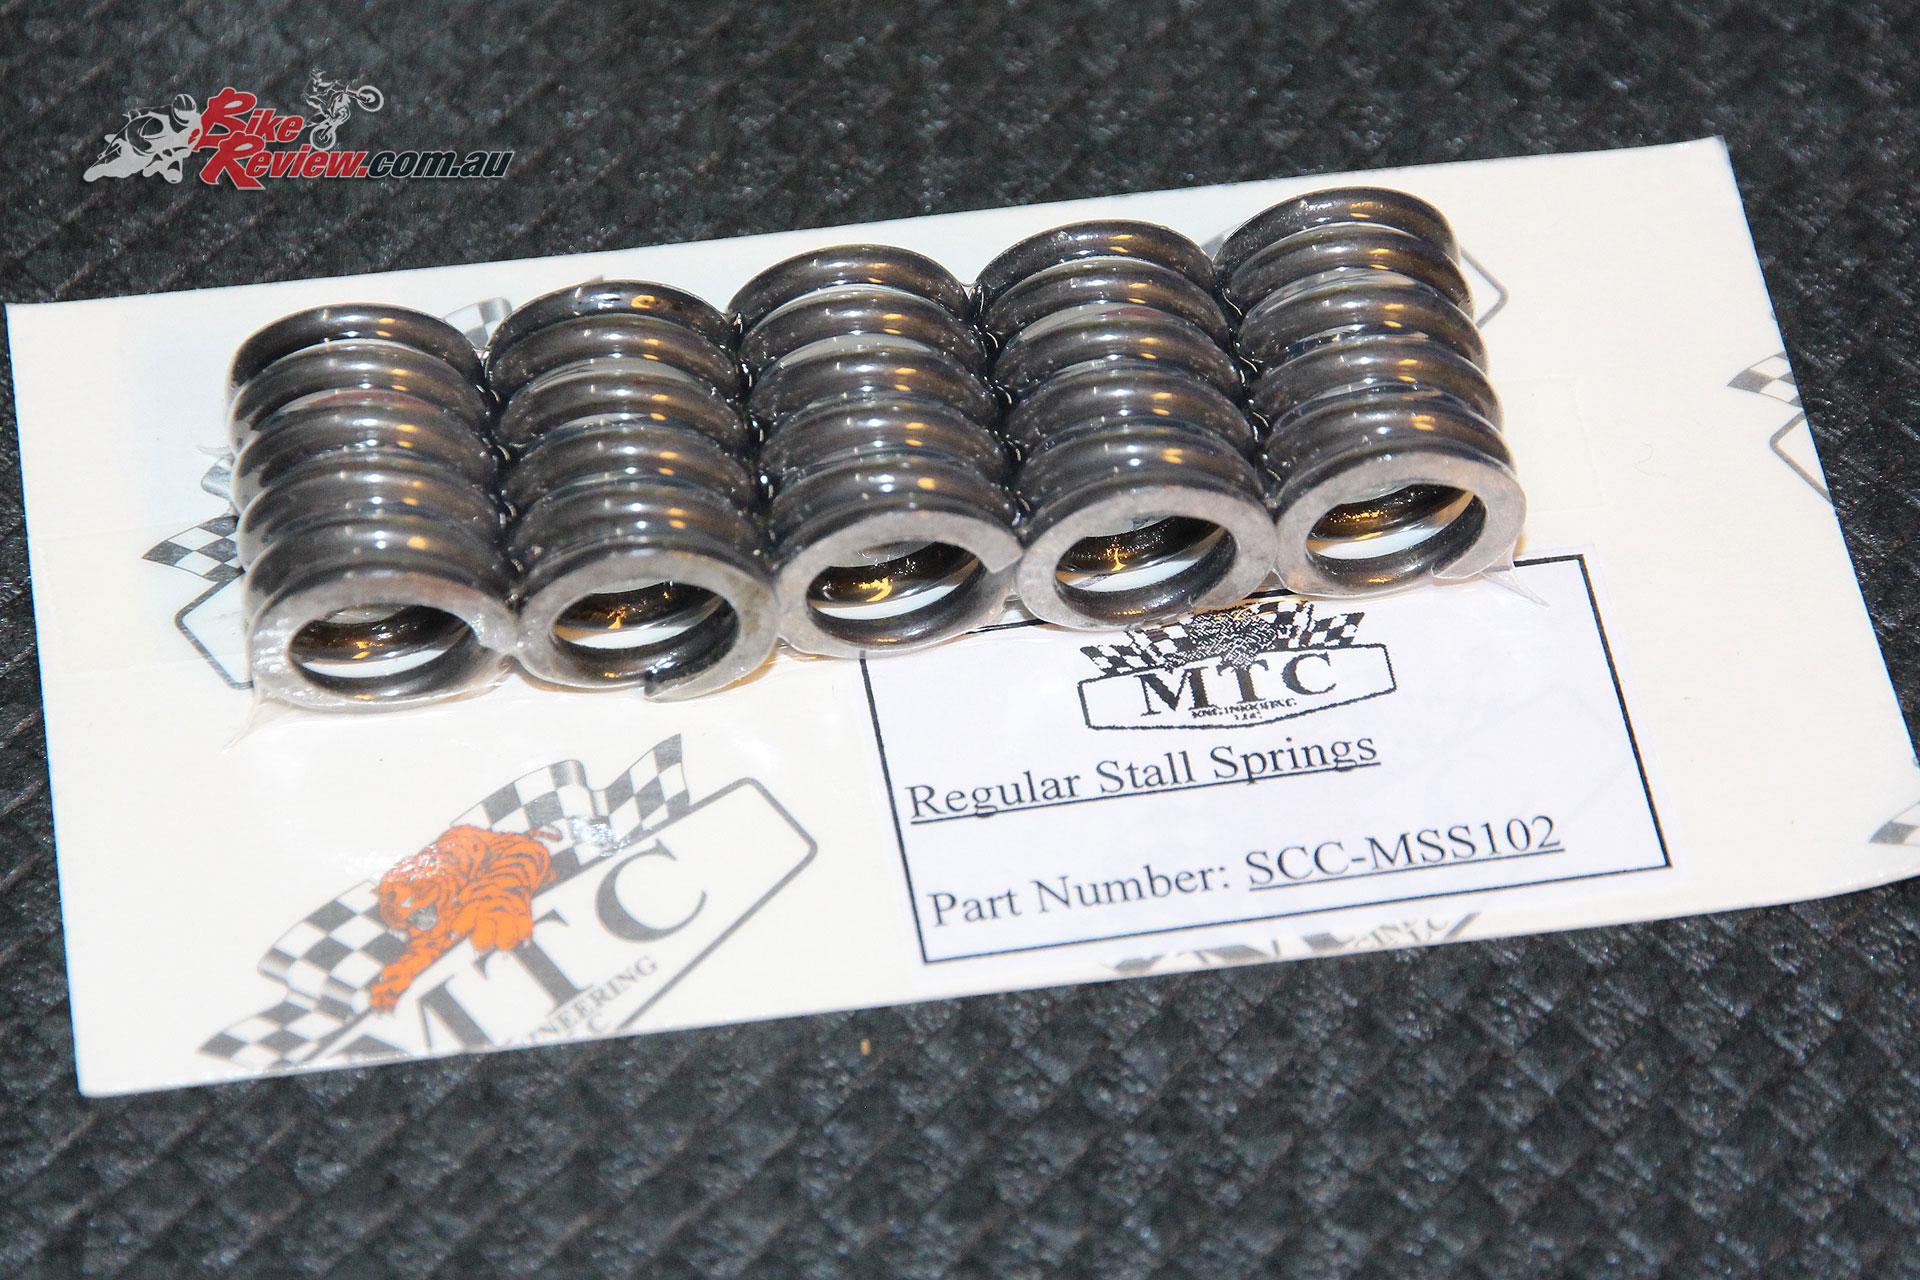 Spare regular stall springs.